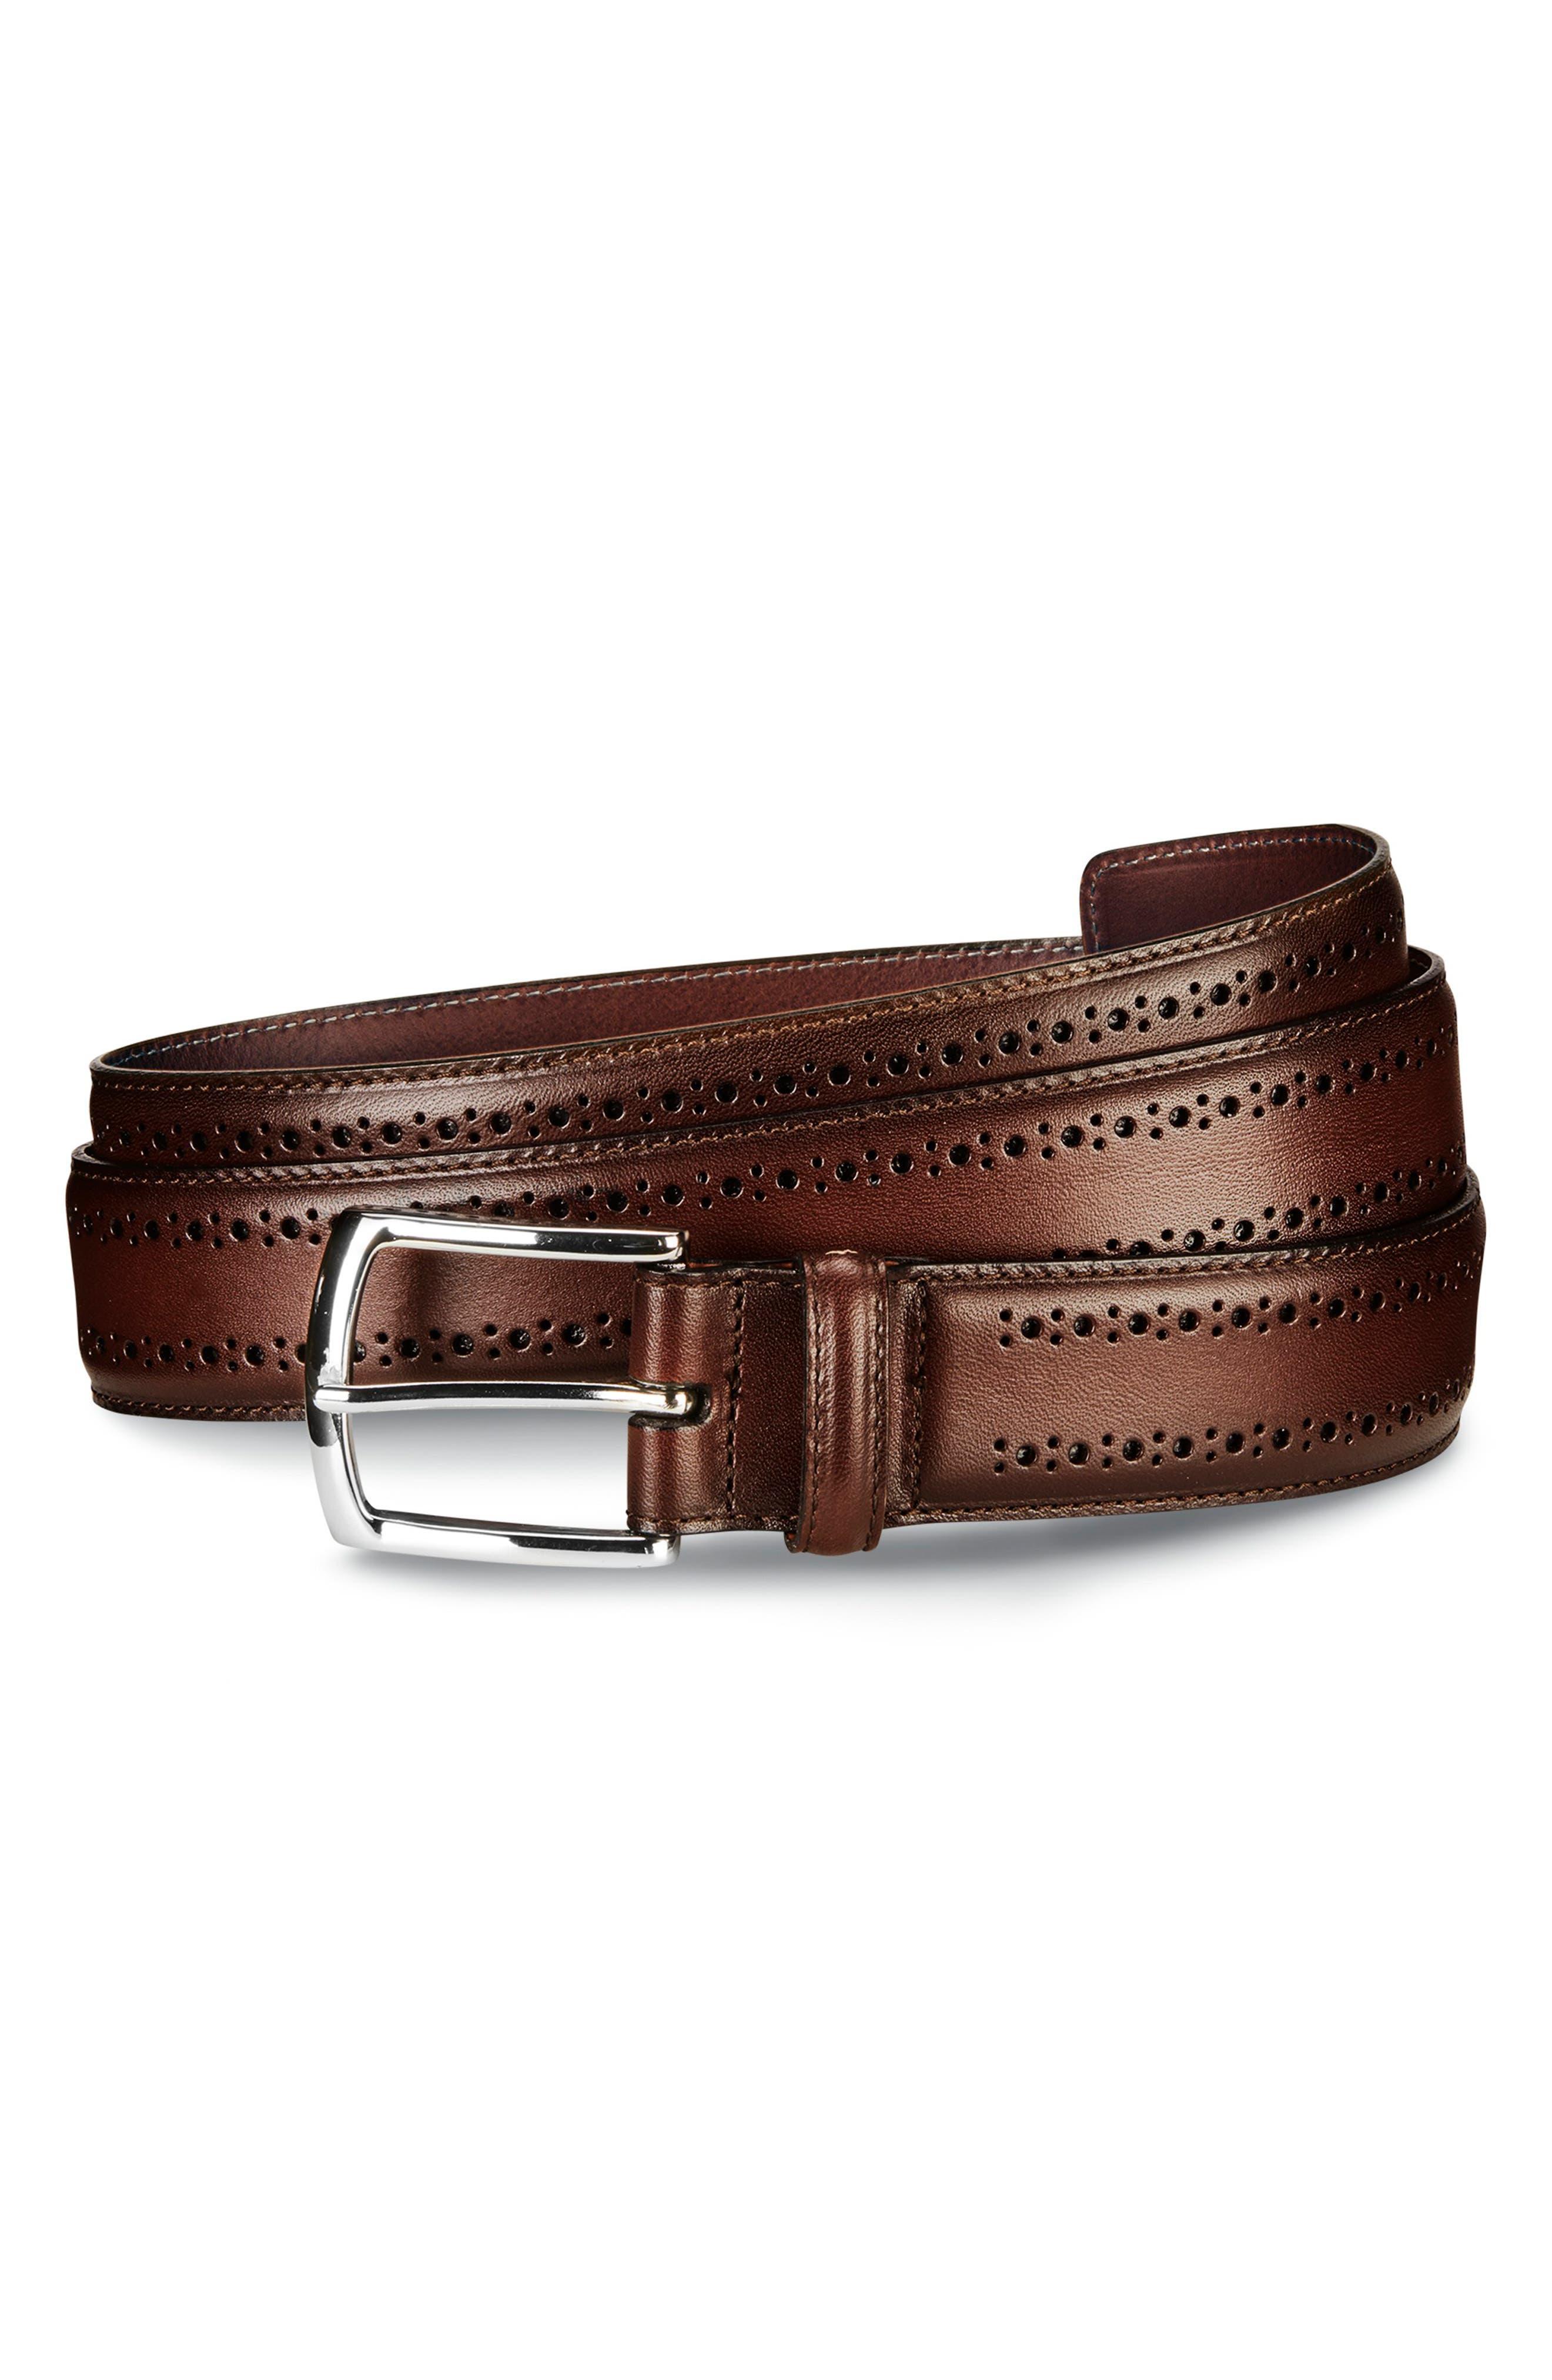 Manistee Brogue Leather Belt